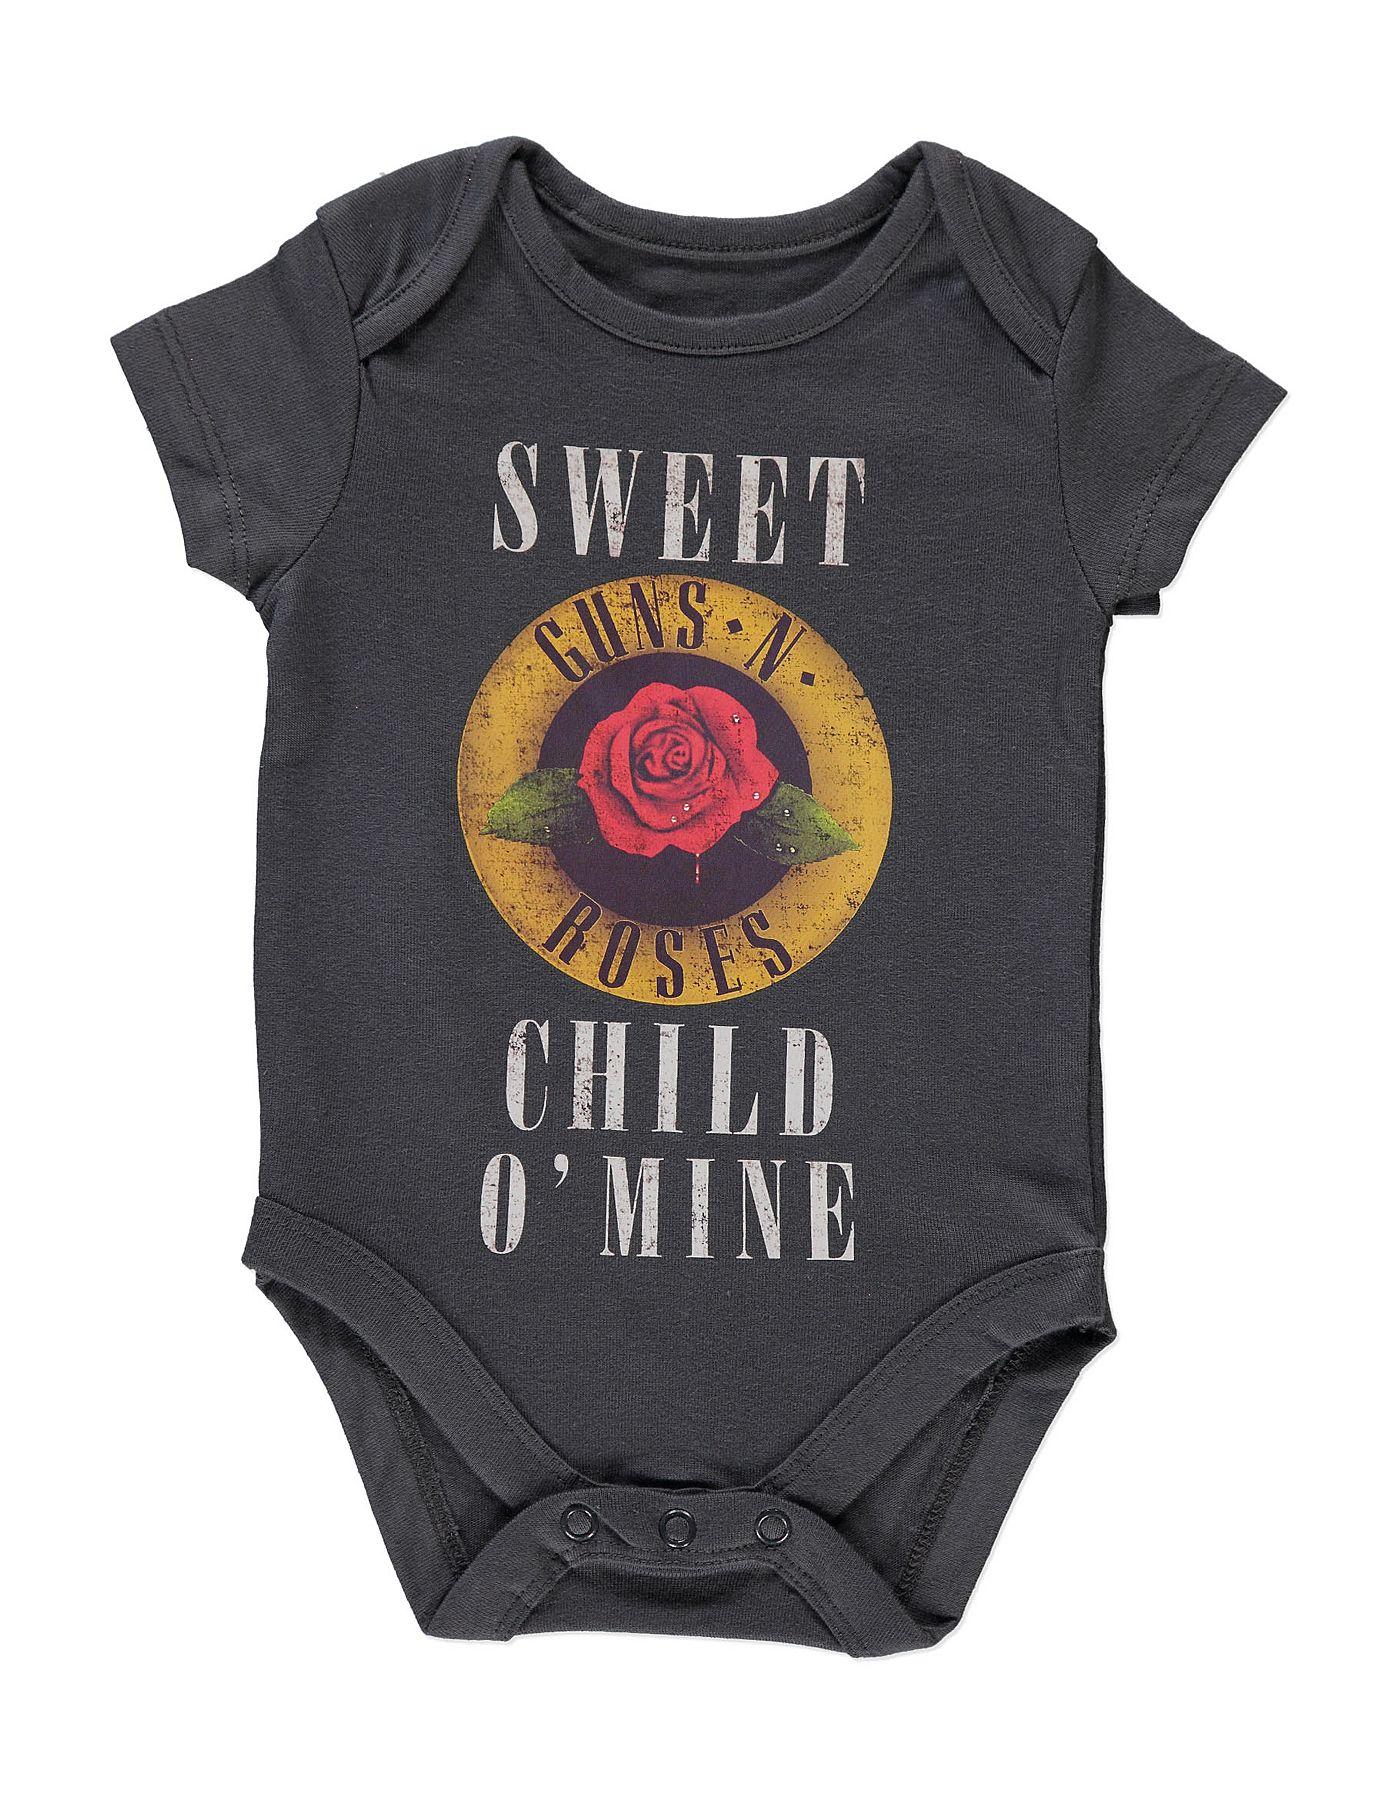 Guns N Roses Bodysuit Baby George At Asda Life Is Good